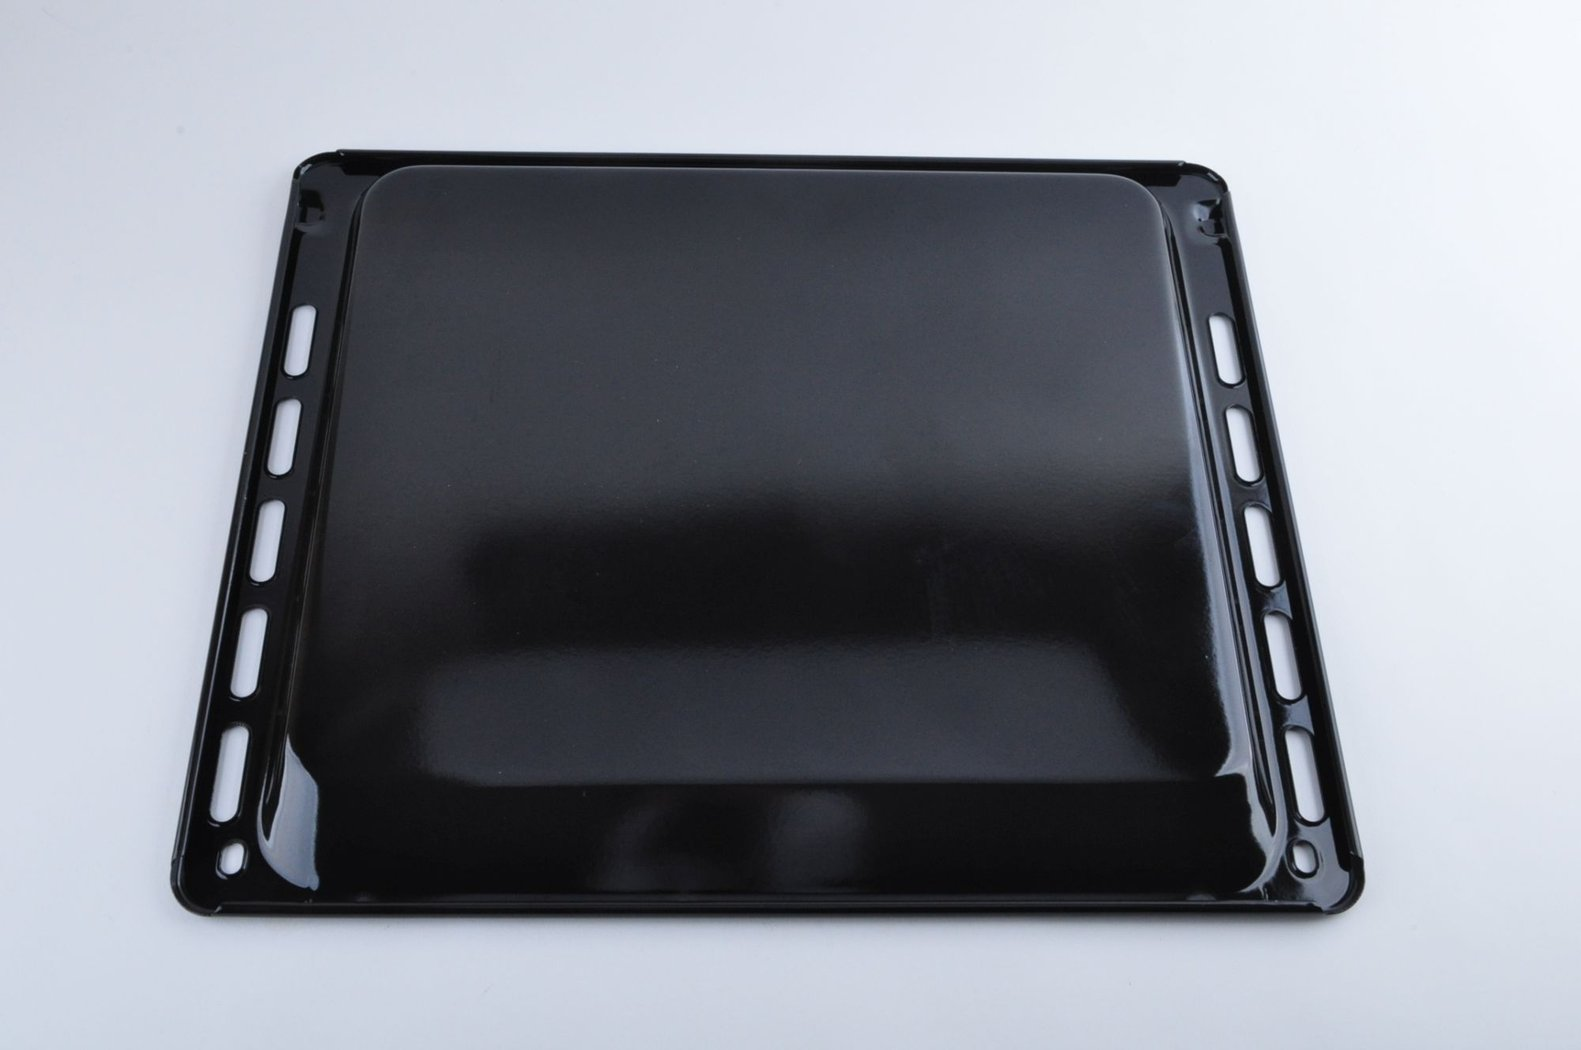 bauknecht whirlpool ikea backblech f r backofen 481010539881. Black Bedroom Furniture Sets. Home Design Ideas